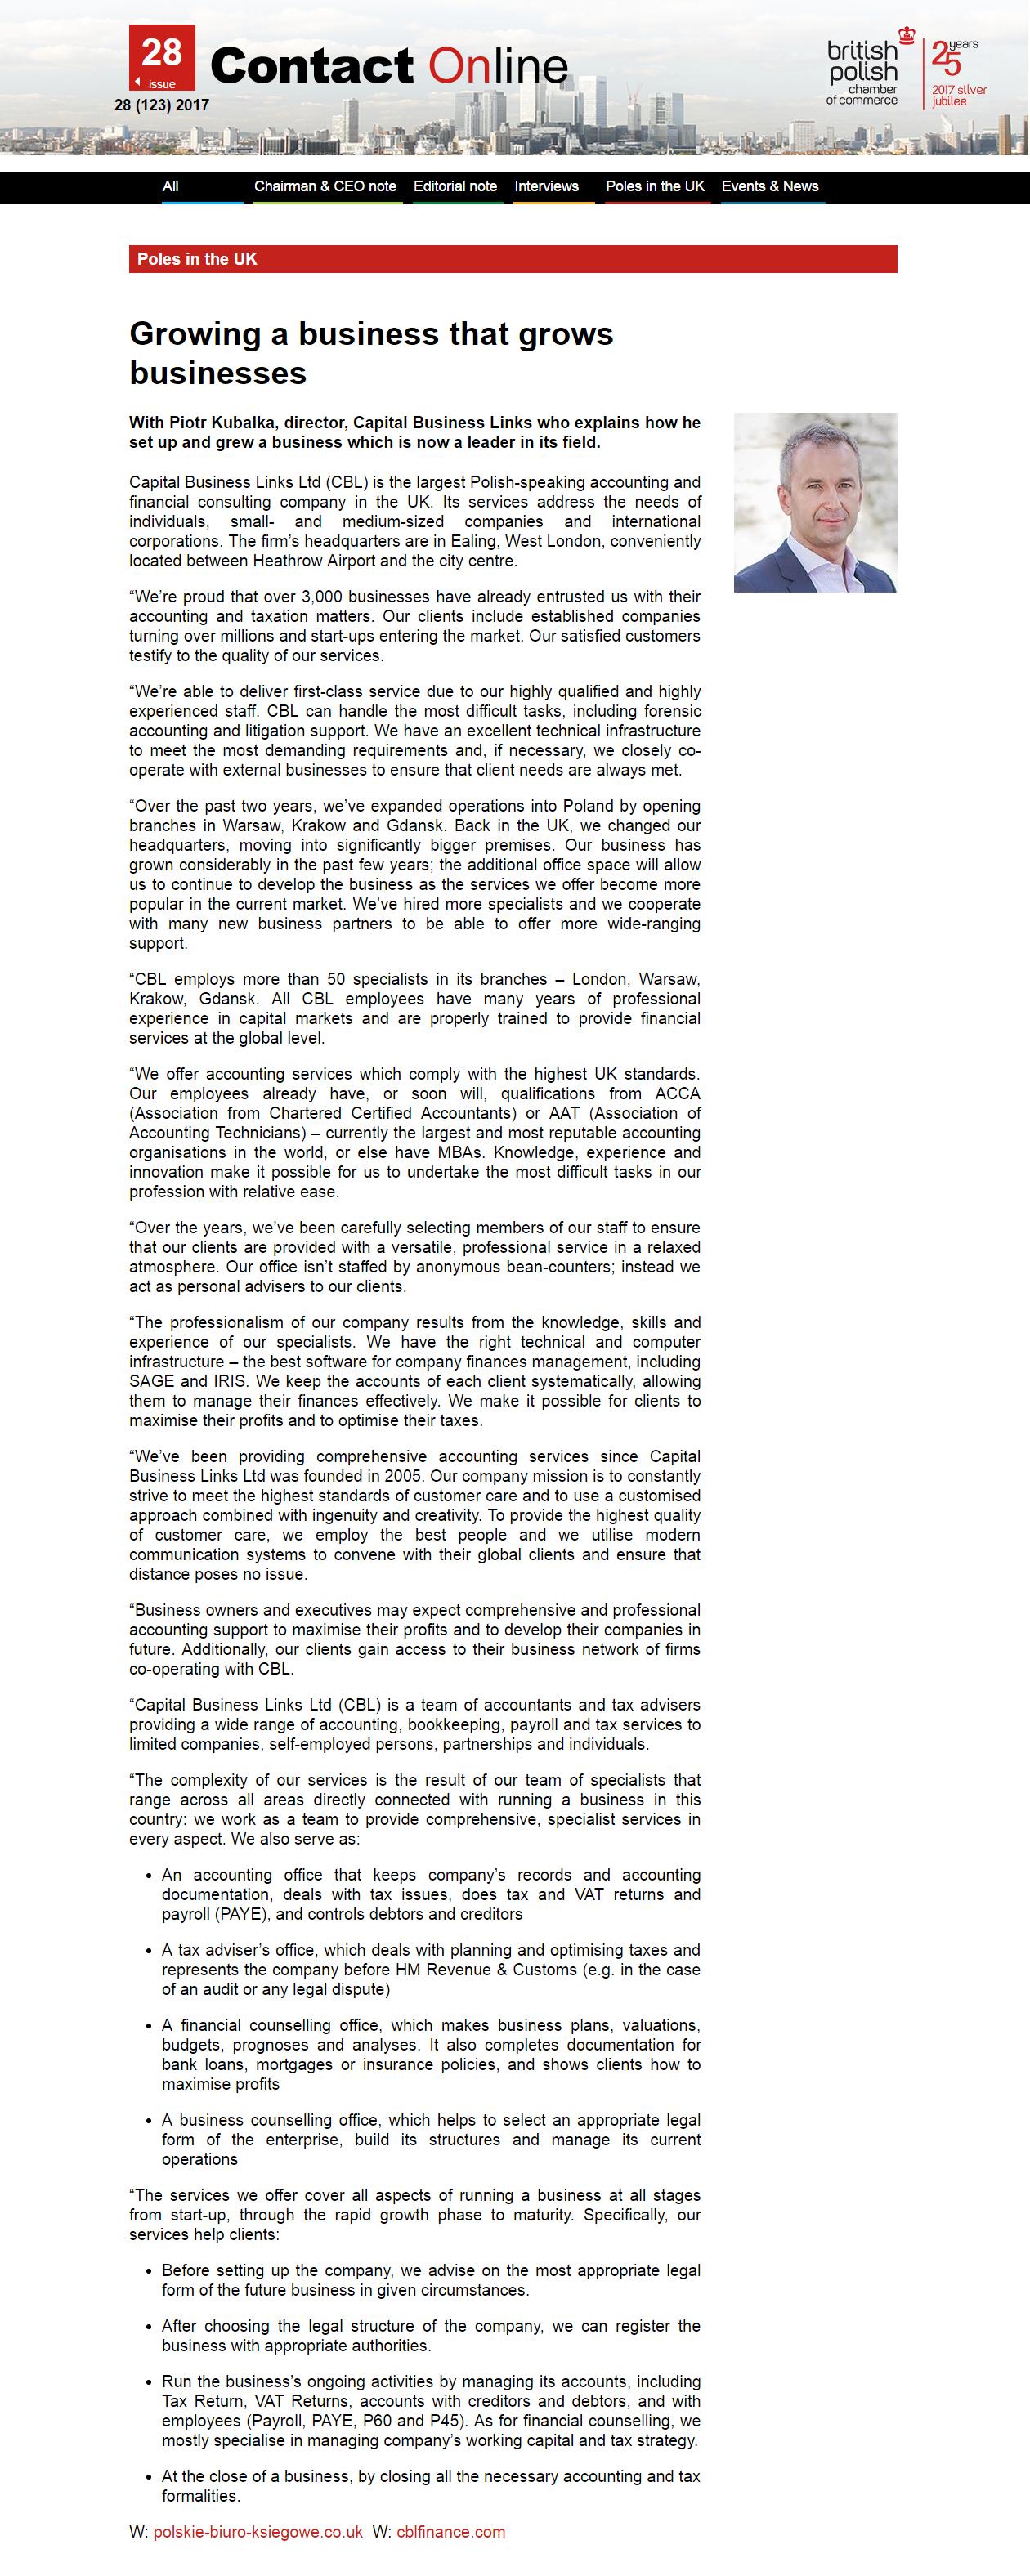 piotr bpcc artykul a